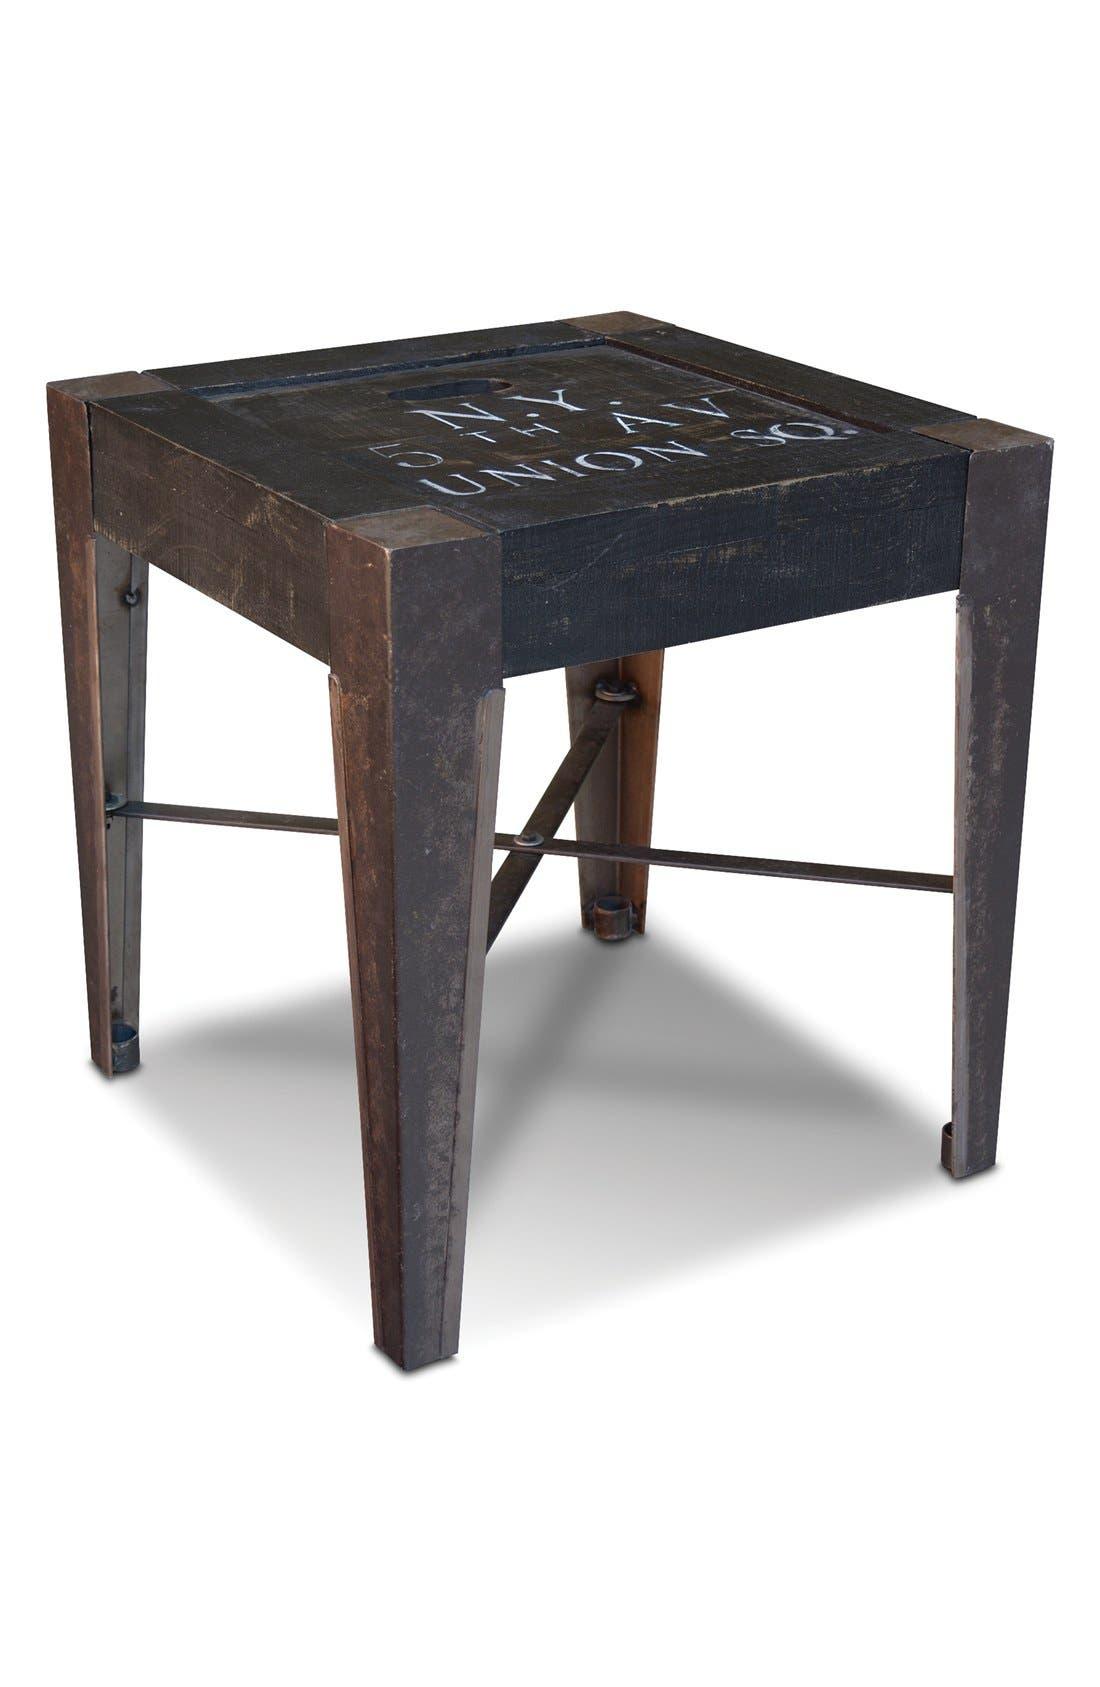 Main Image - Horizon Home 'Graffiti' End Table